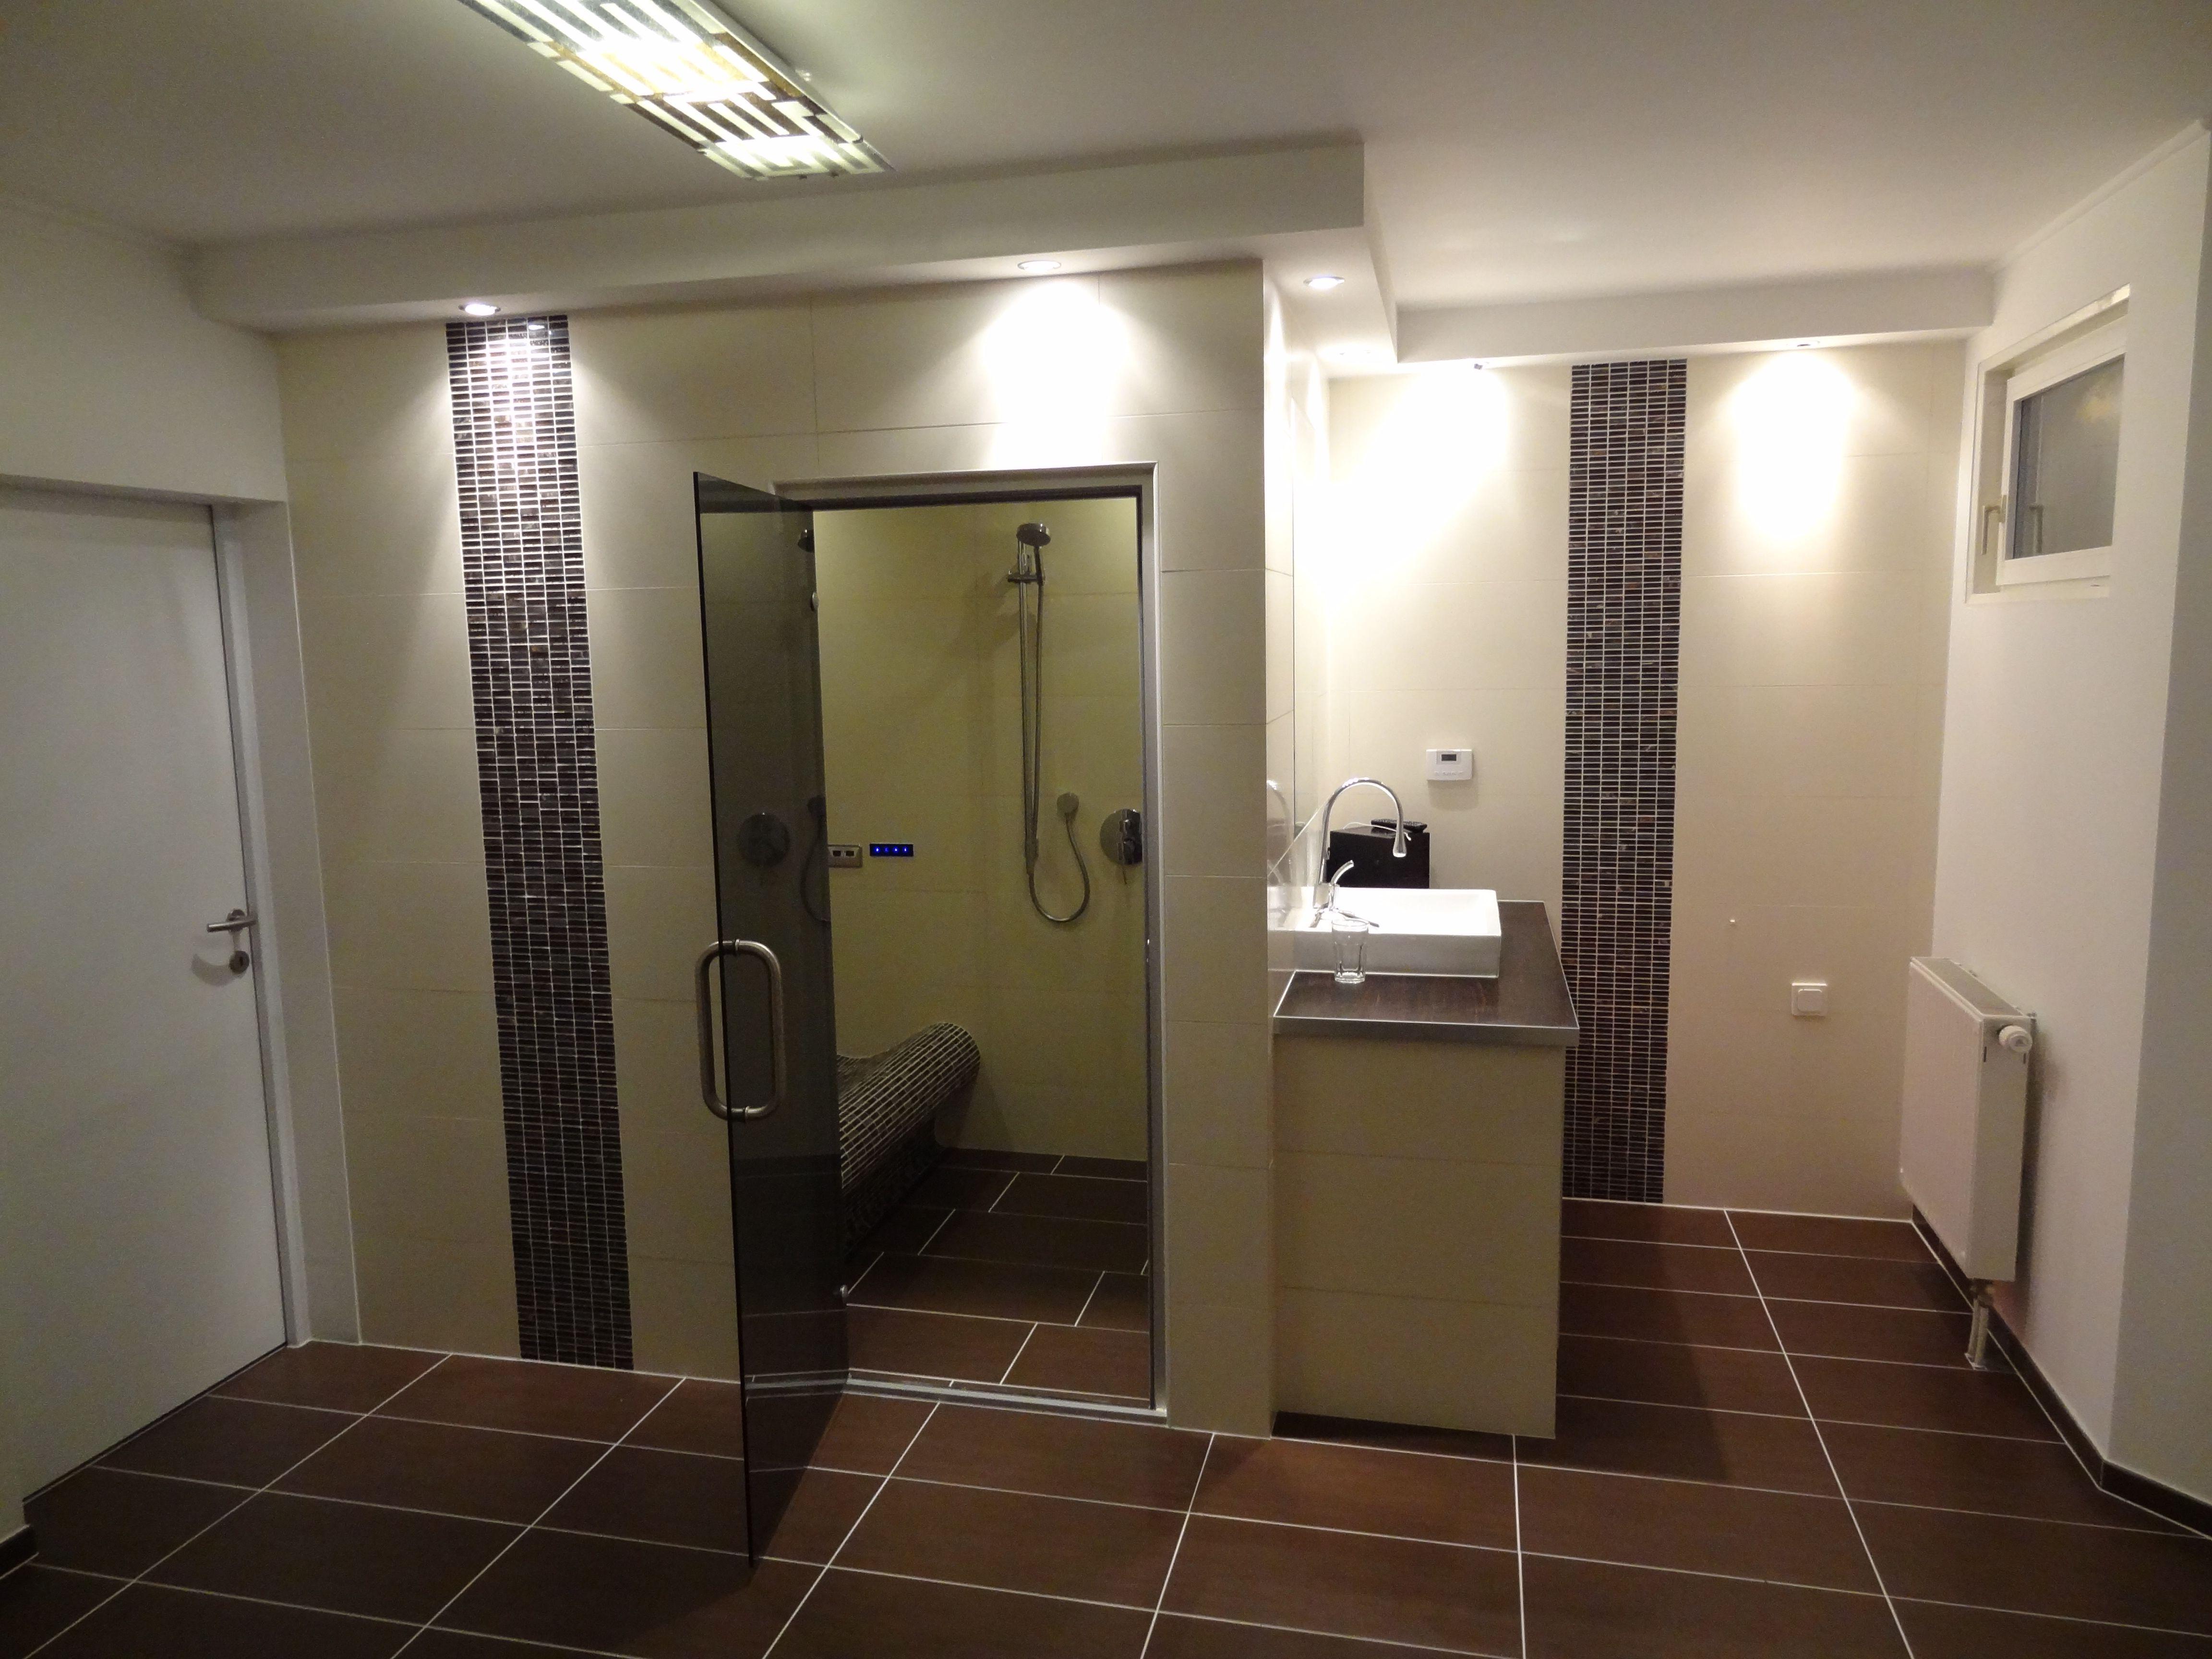 Bathroom With A Steam Room Kellerausbau Mit Dampfbad Dampfbad